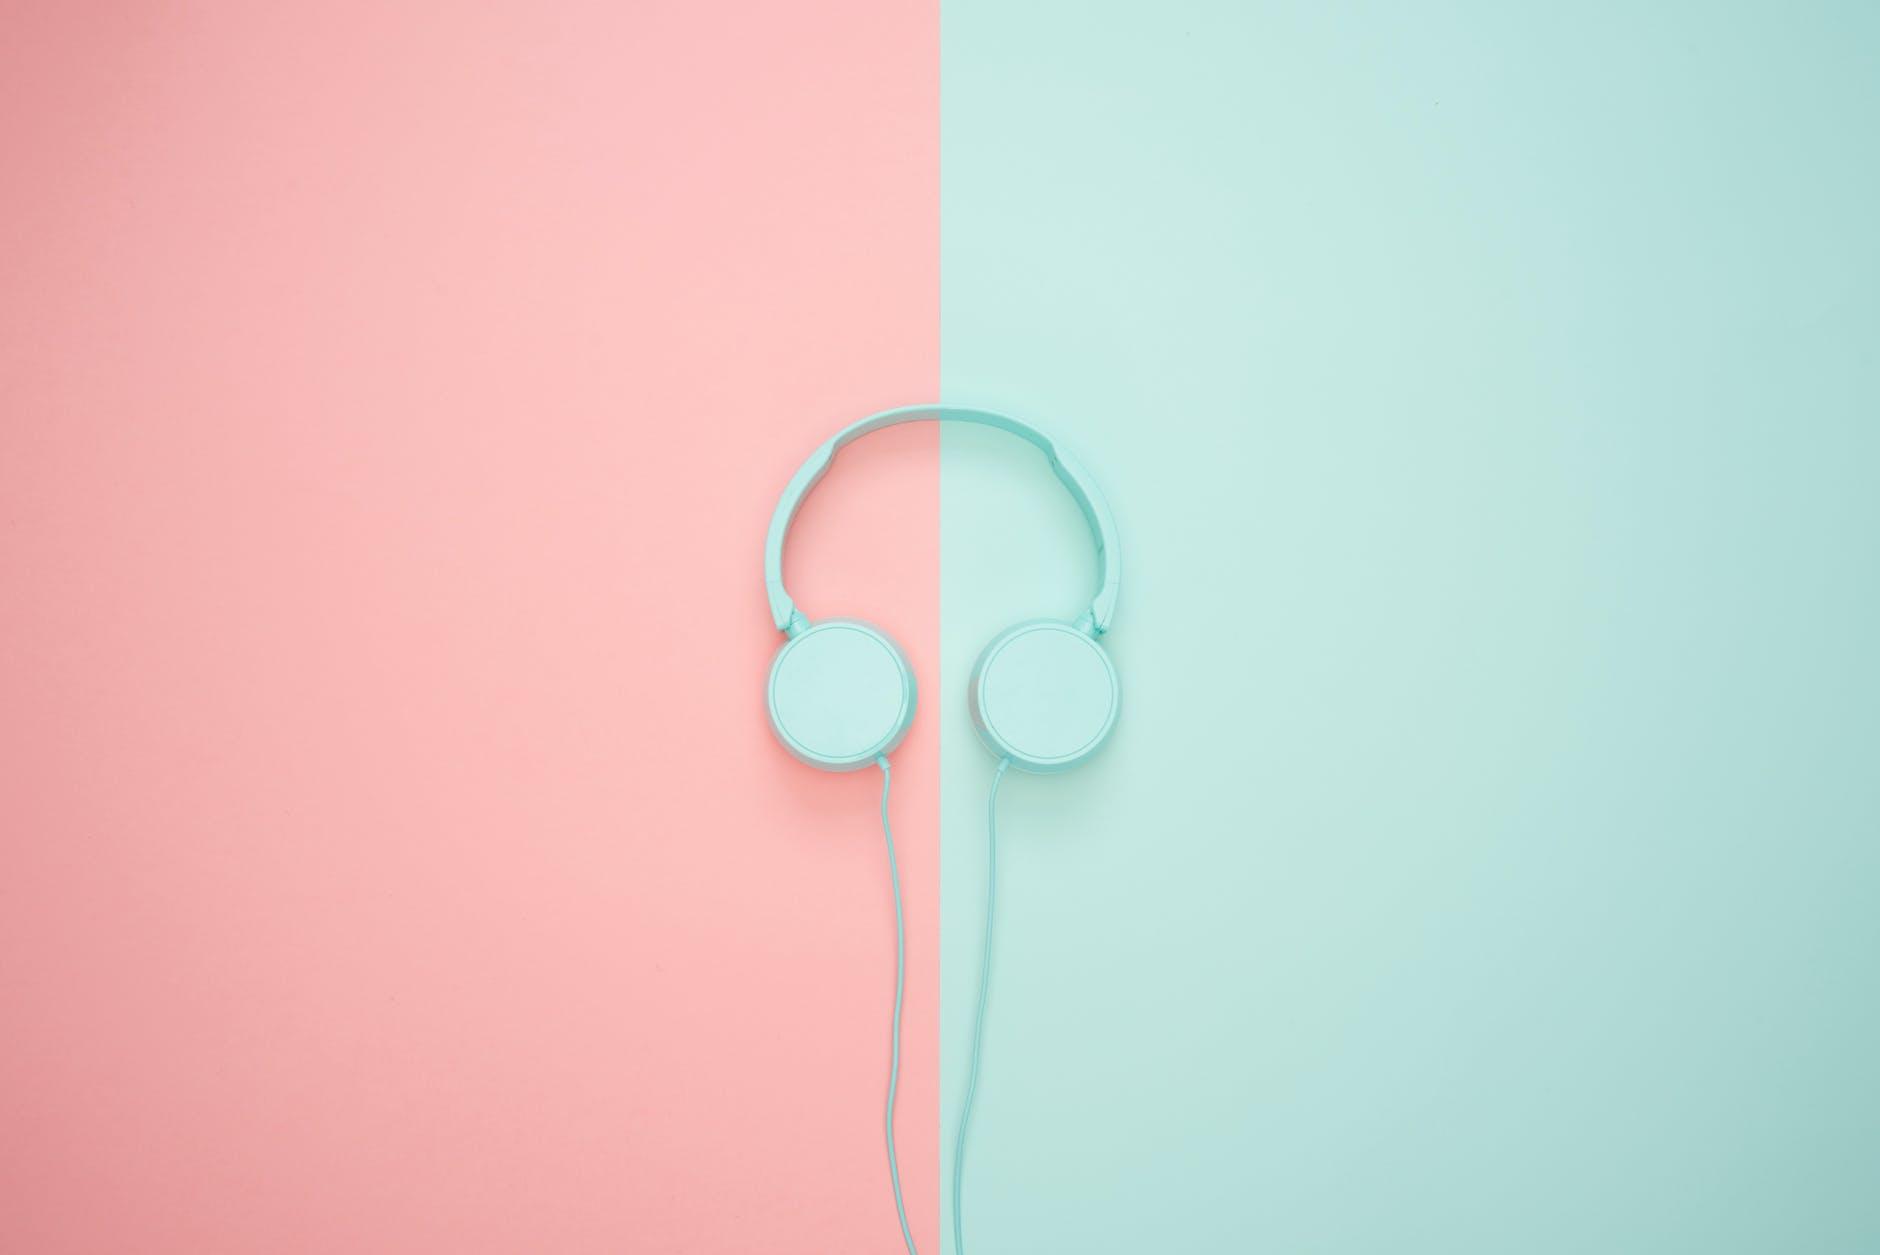 blue headphone